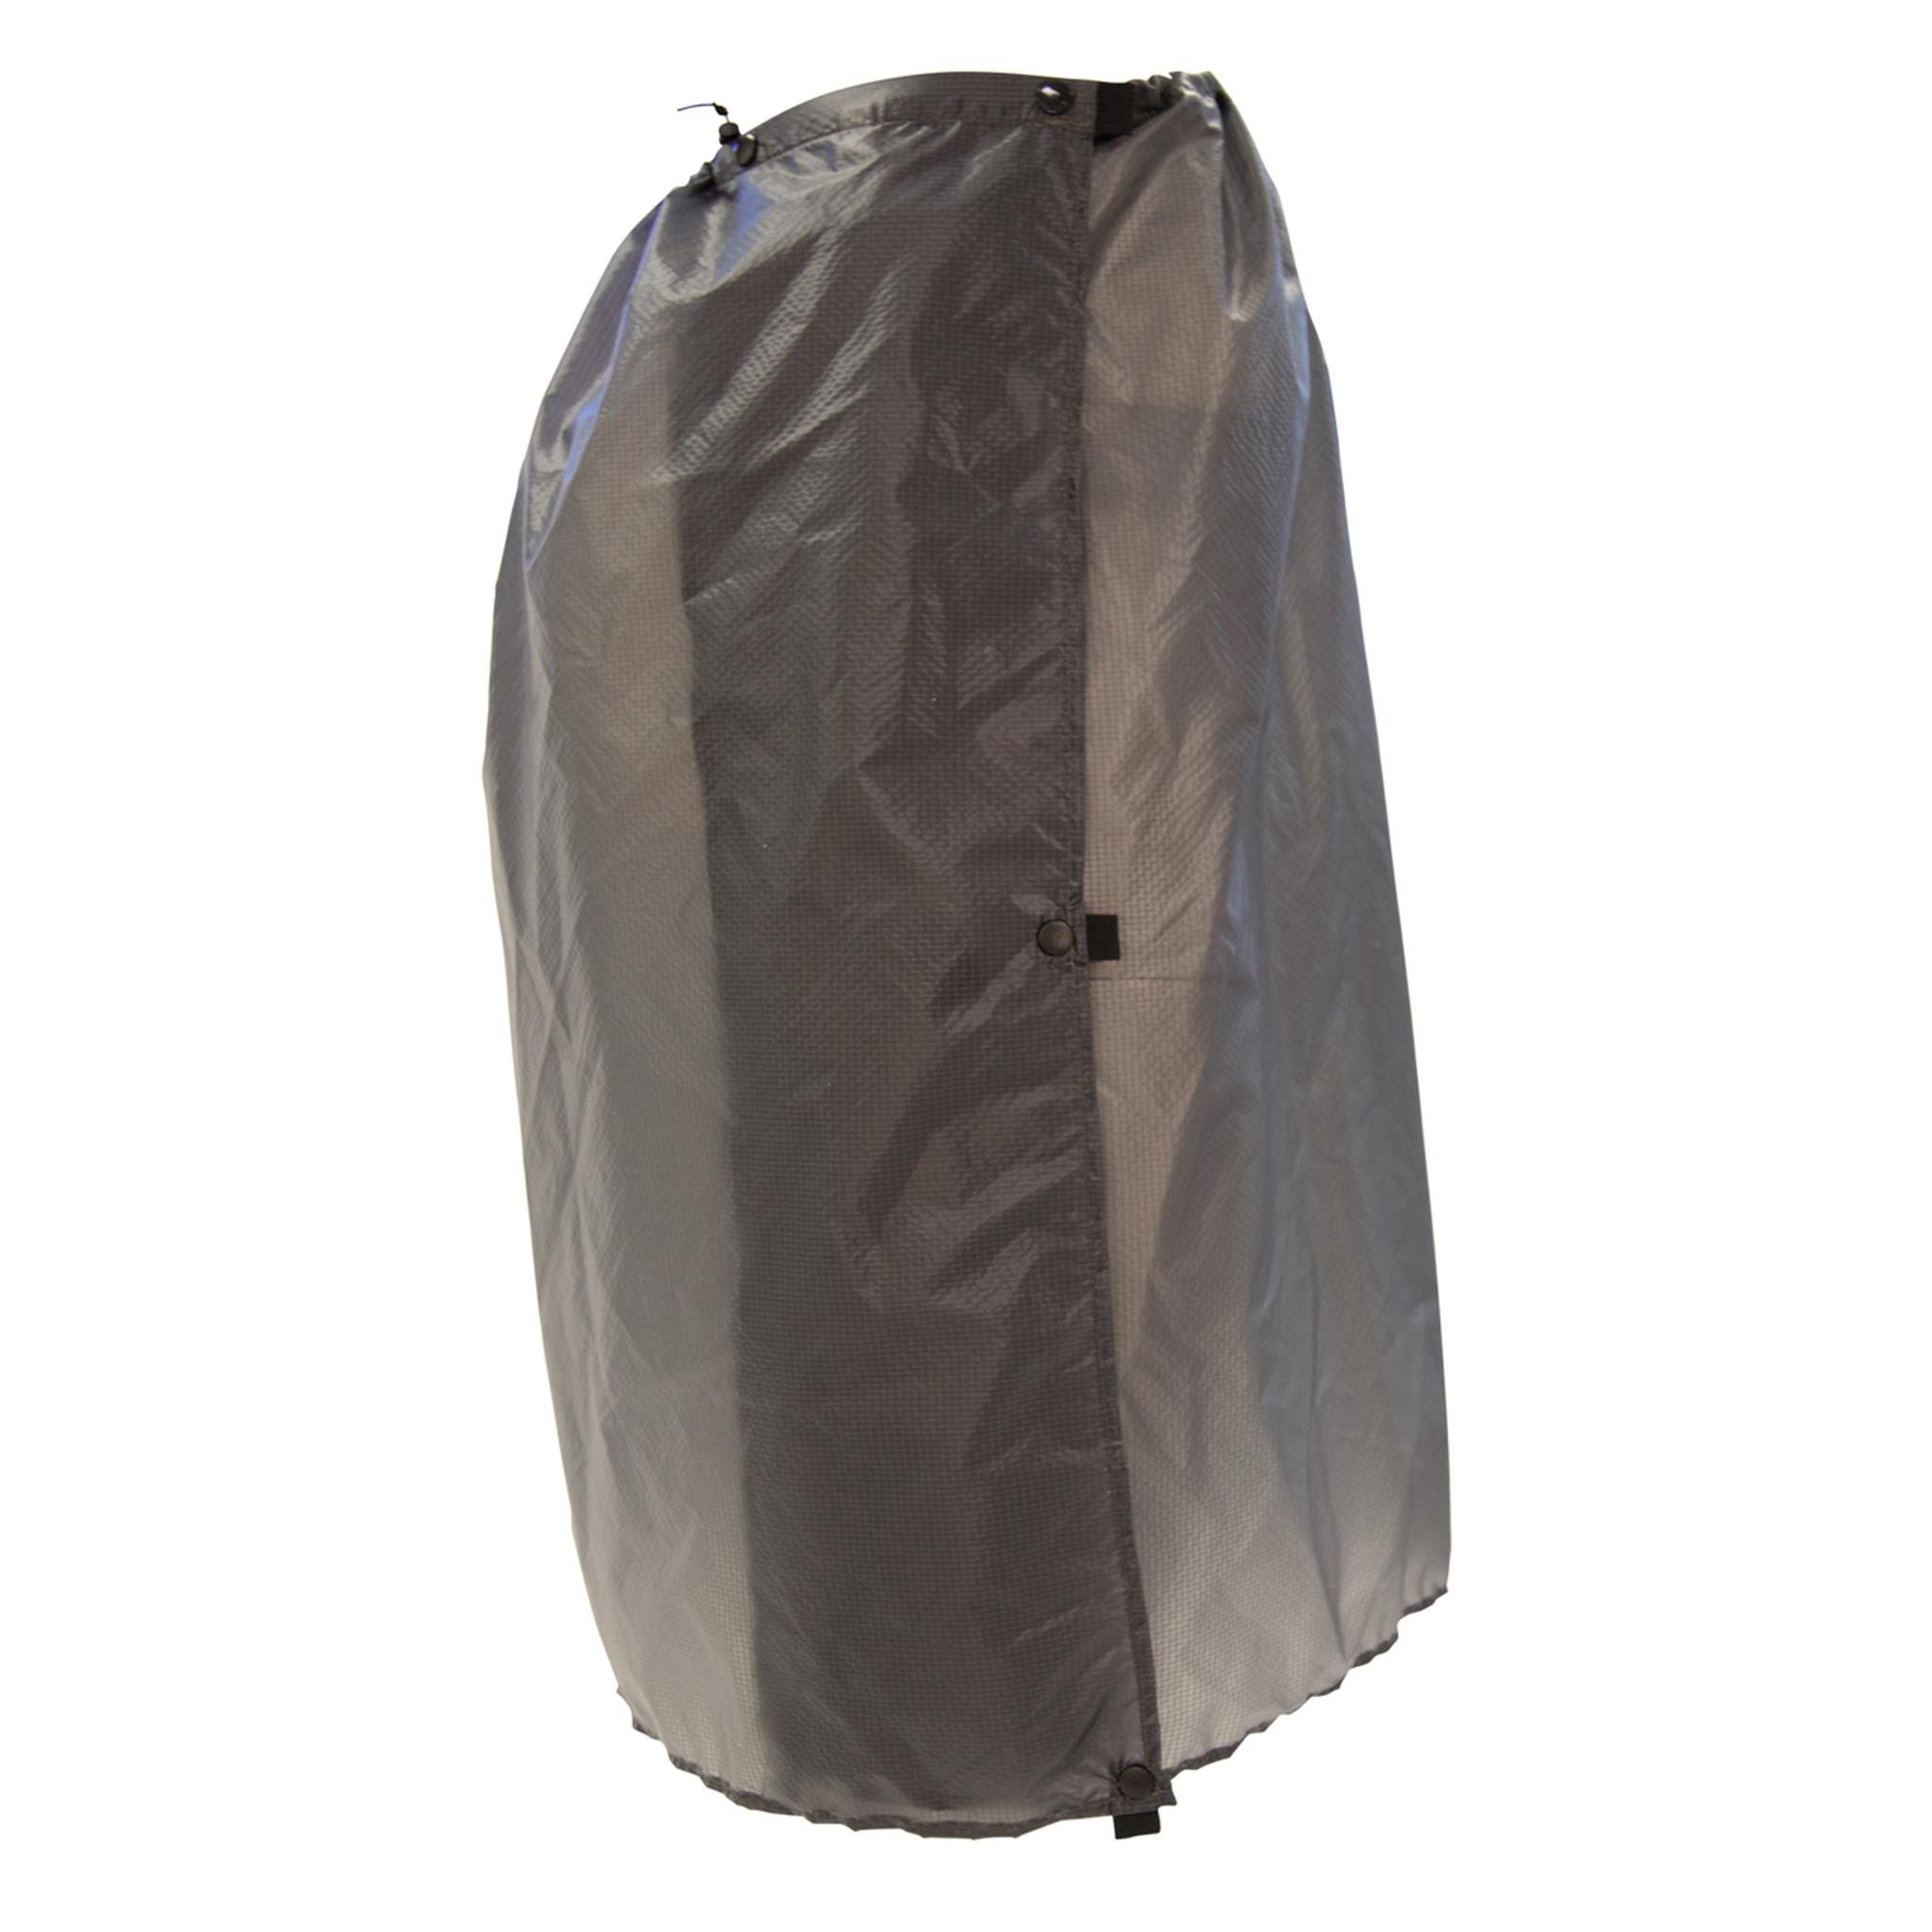 Waterproof Rain Skirt Silicone Coating Rain Cover Hiking Camping Wear Pants